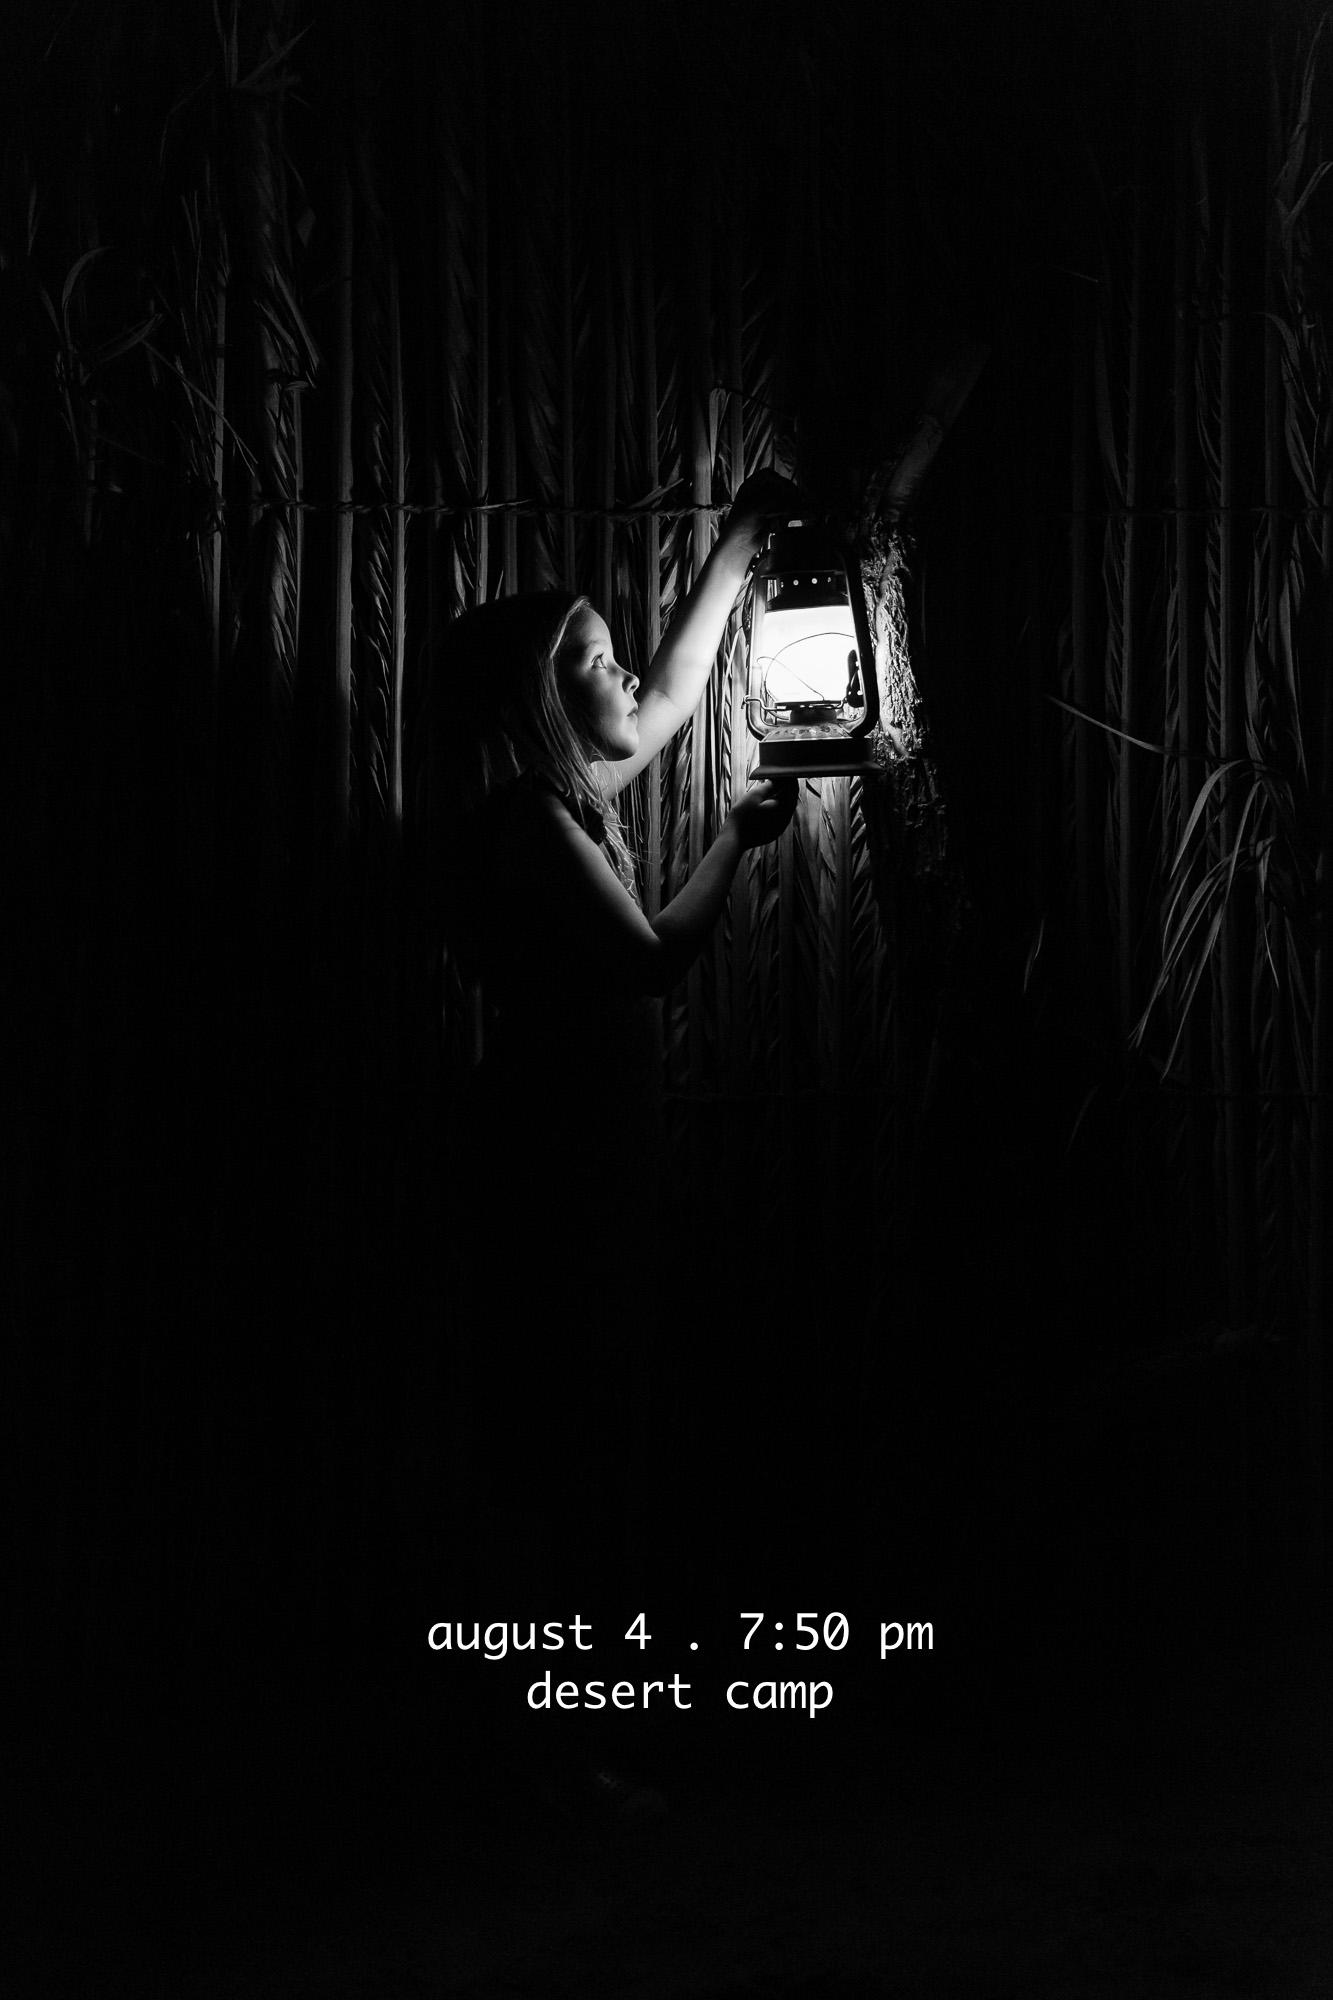 217-367-2016-Aug4-Web-4